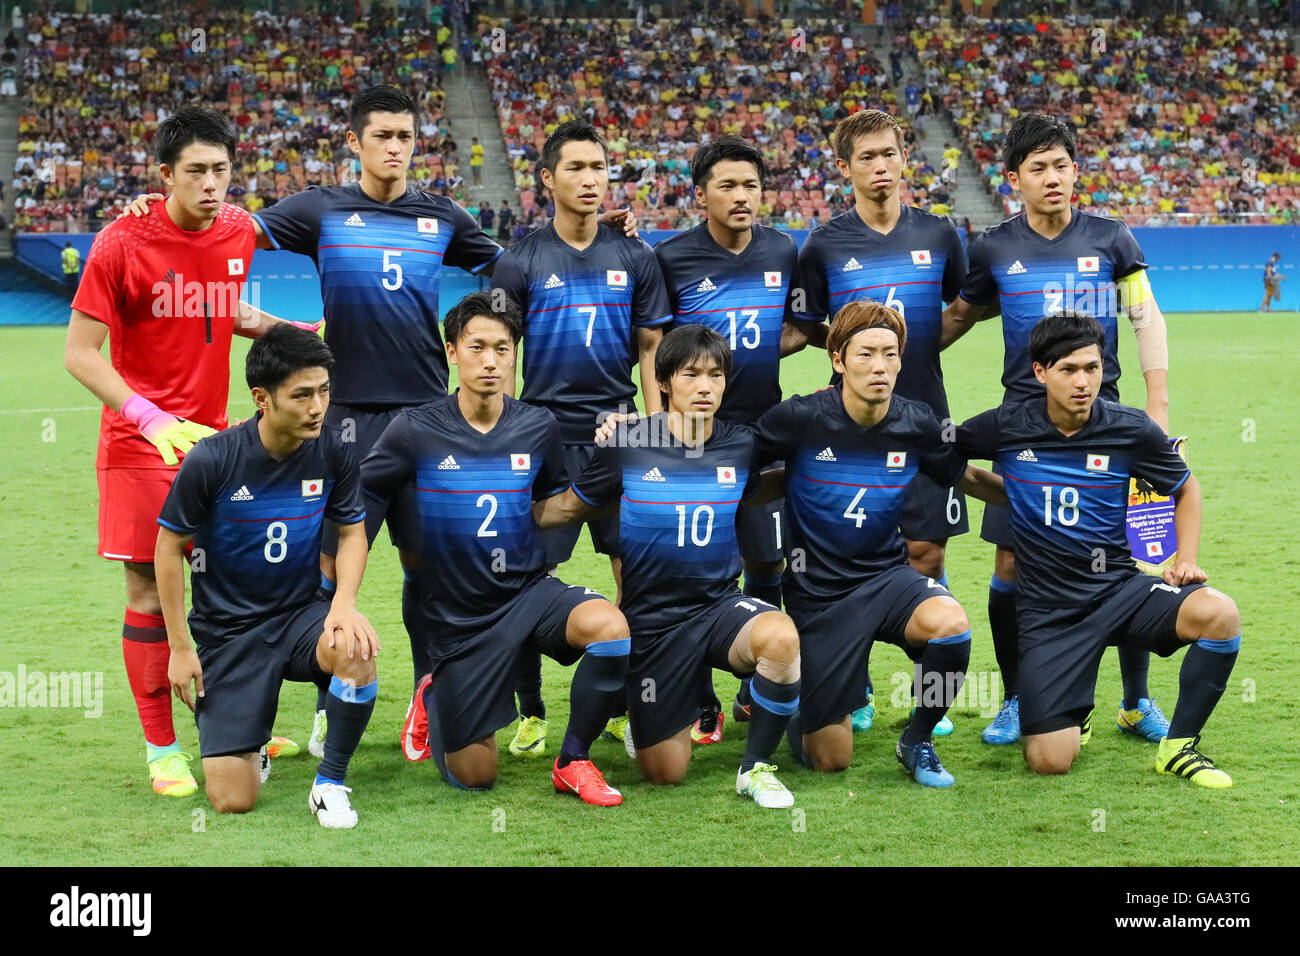 U 23 Japan Team Group Line Up Imágenes De Stock   U 23 Japan Team ... 71bda617c4cd8